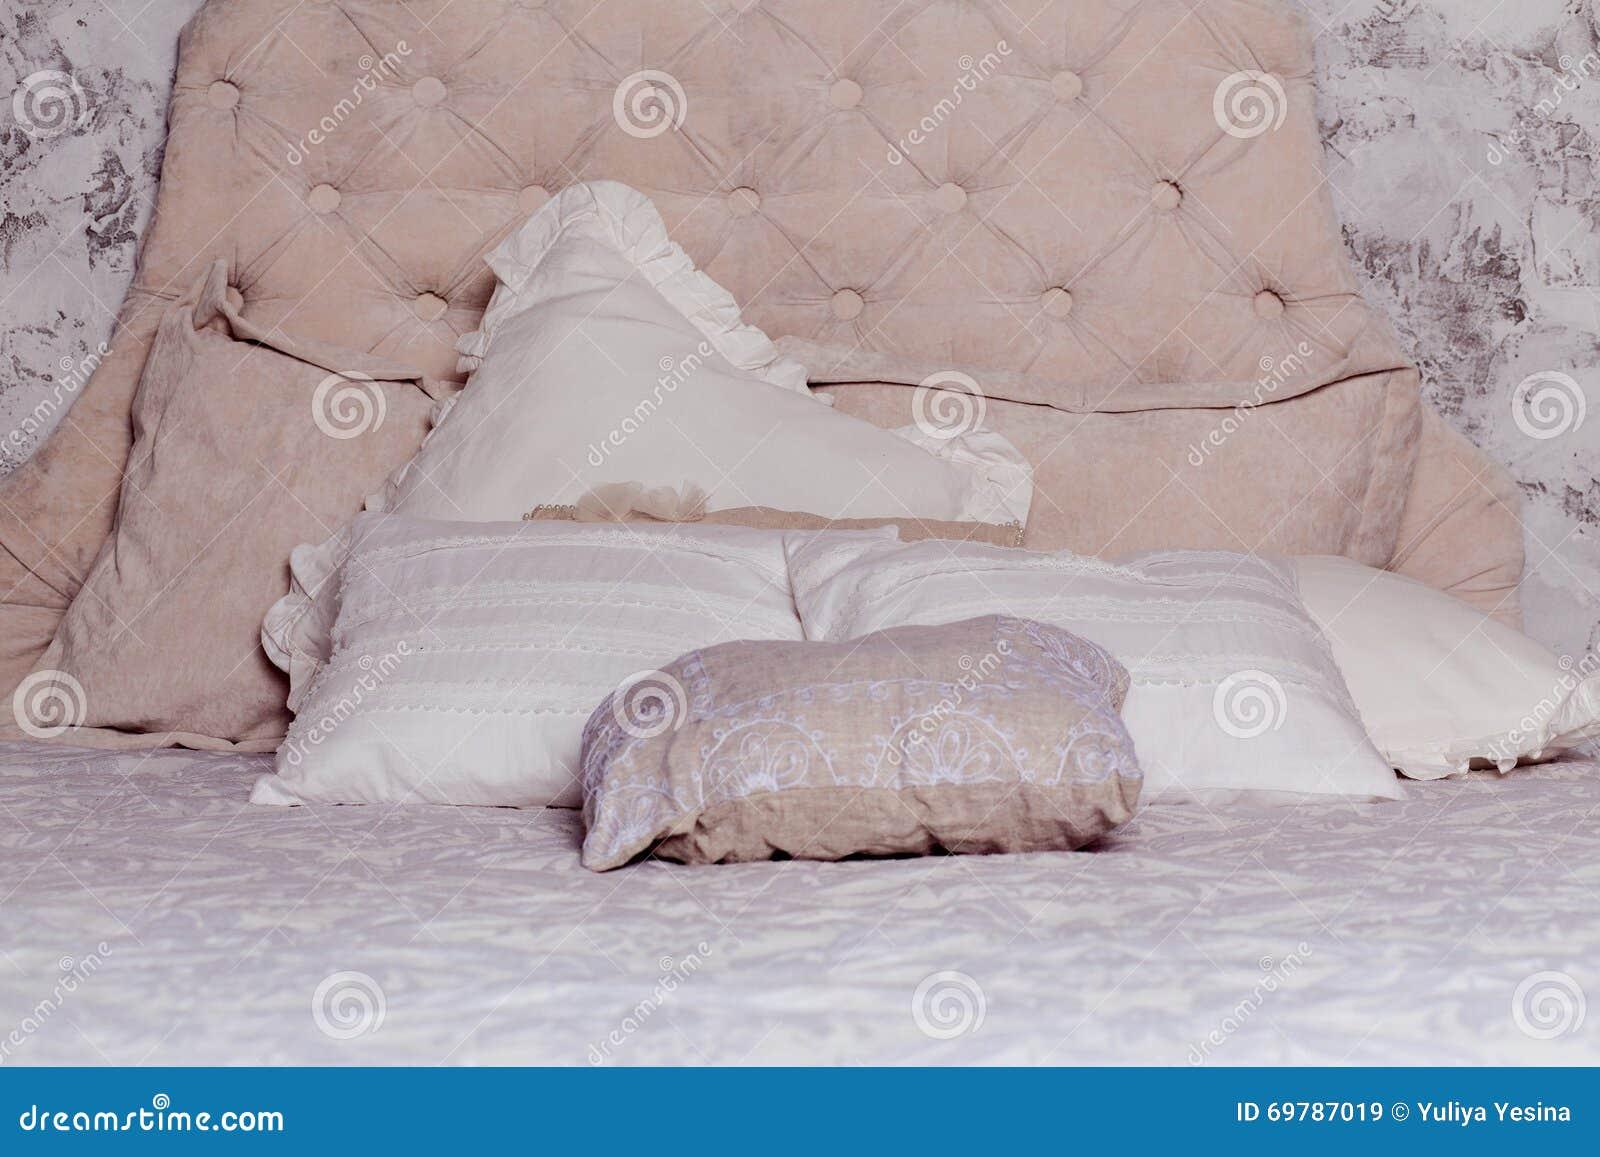 Witte hoofdkussens op klassiek bed in slaapkamer stock foto afbeelding 69787019 - Klassiek bed ...